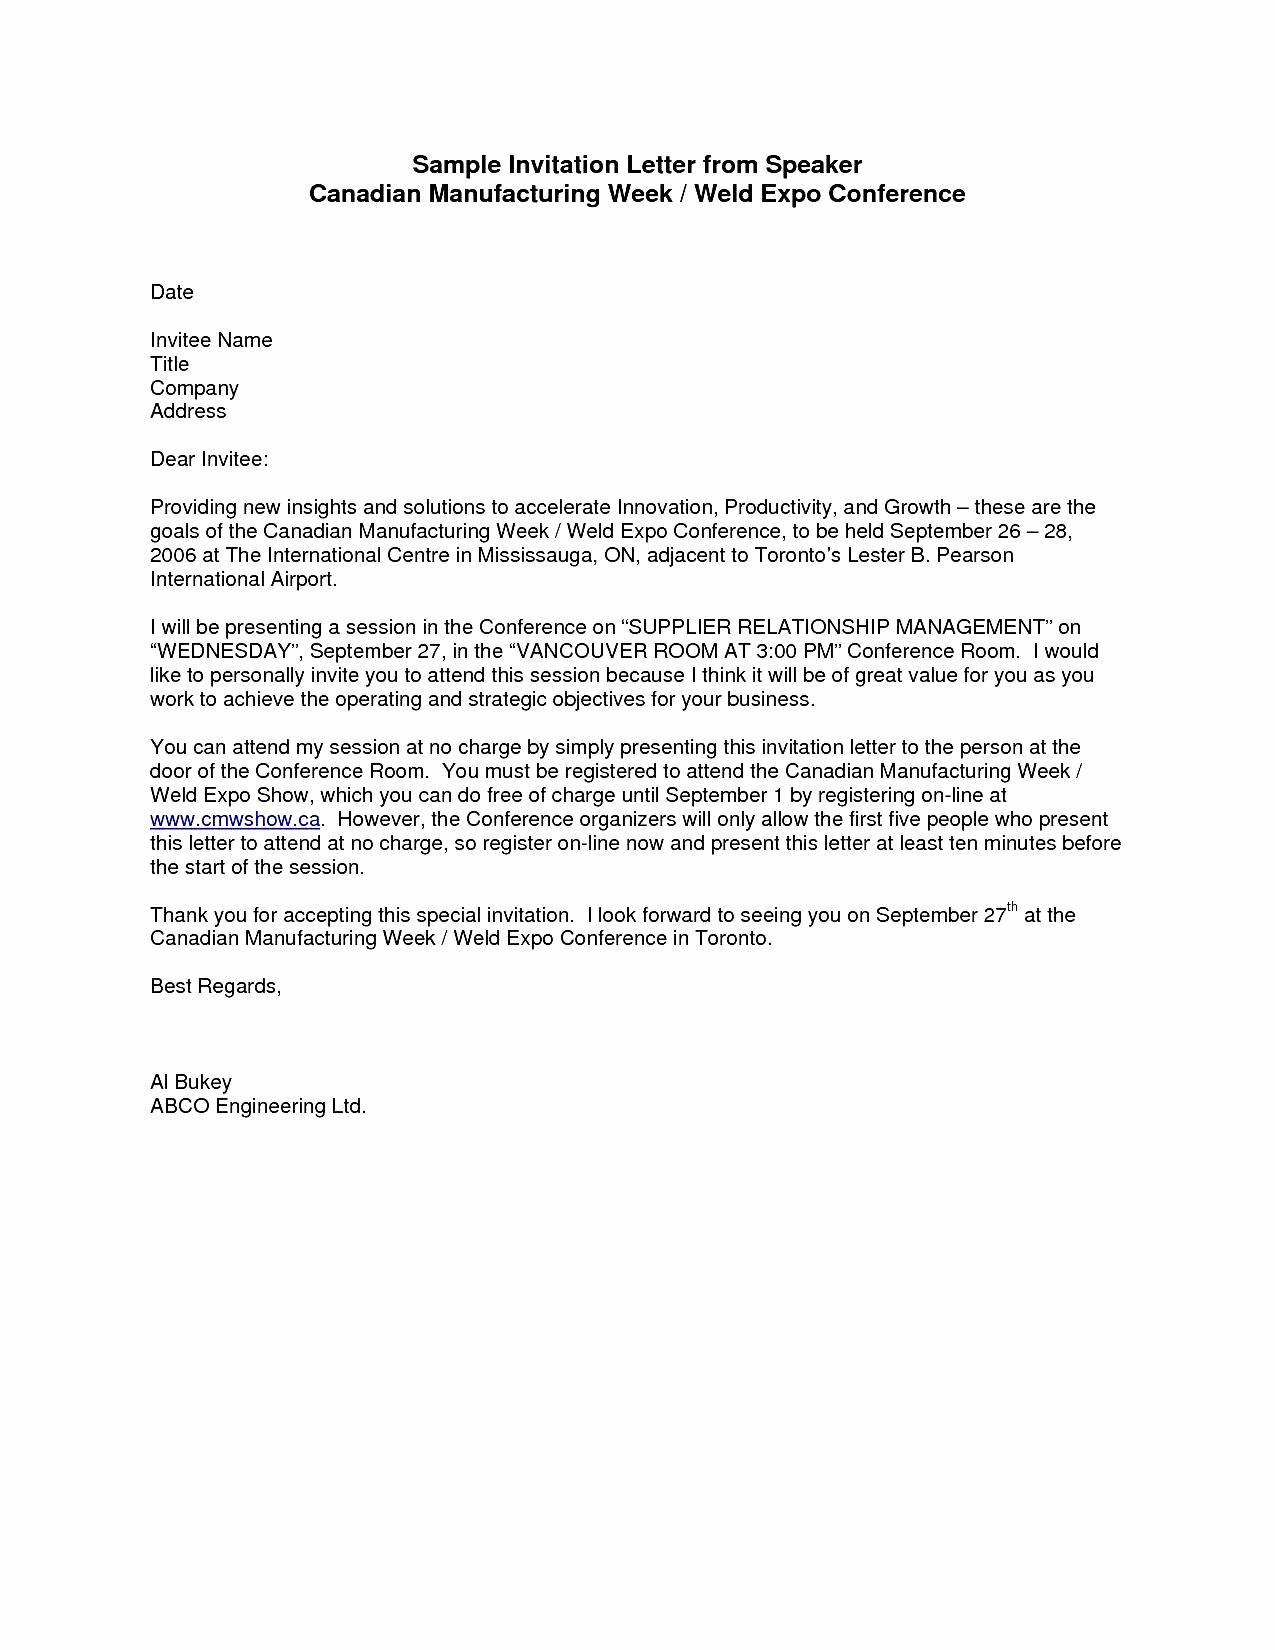 Sample Graduation Invitation Letter Fresh Sample formal Invitation Letter for A Guest Speaker